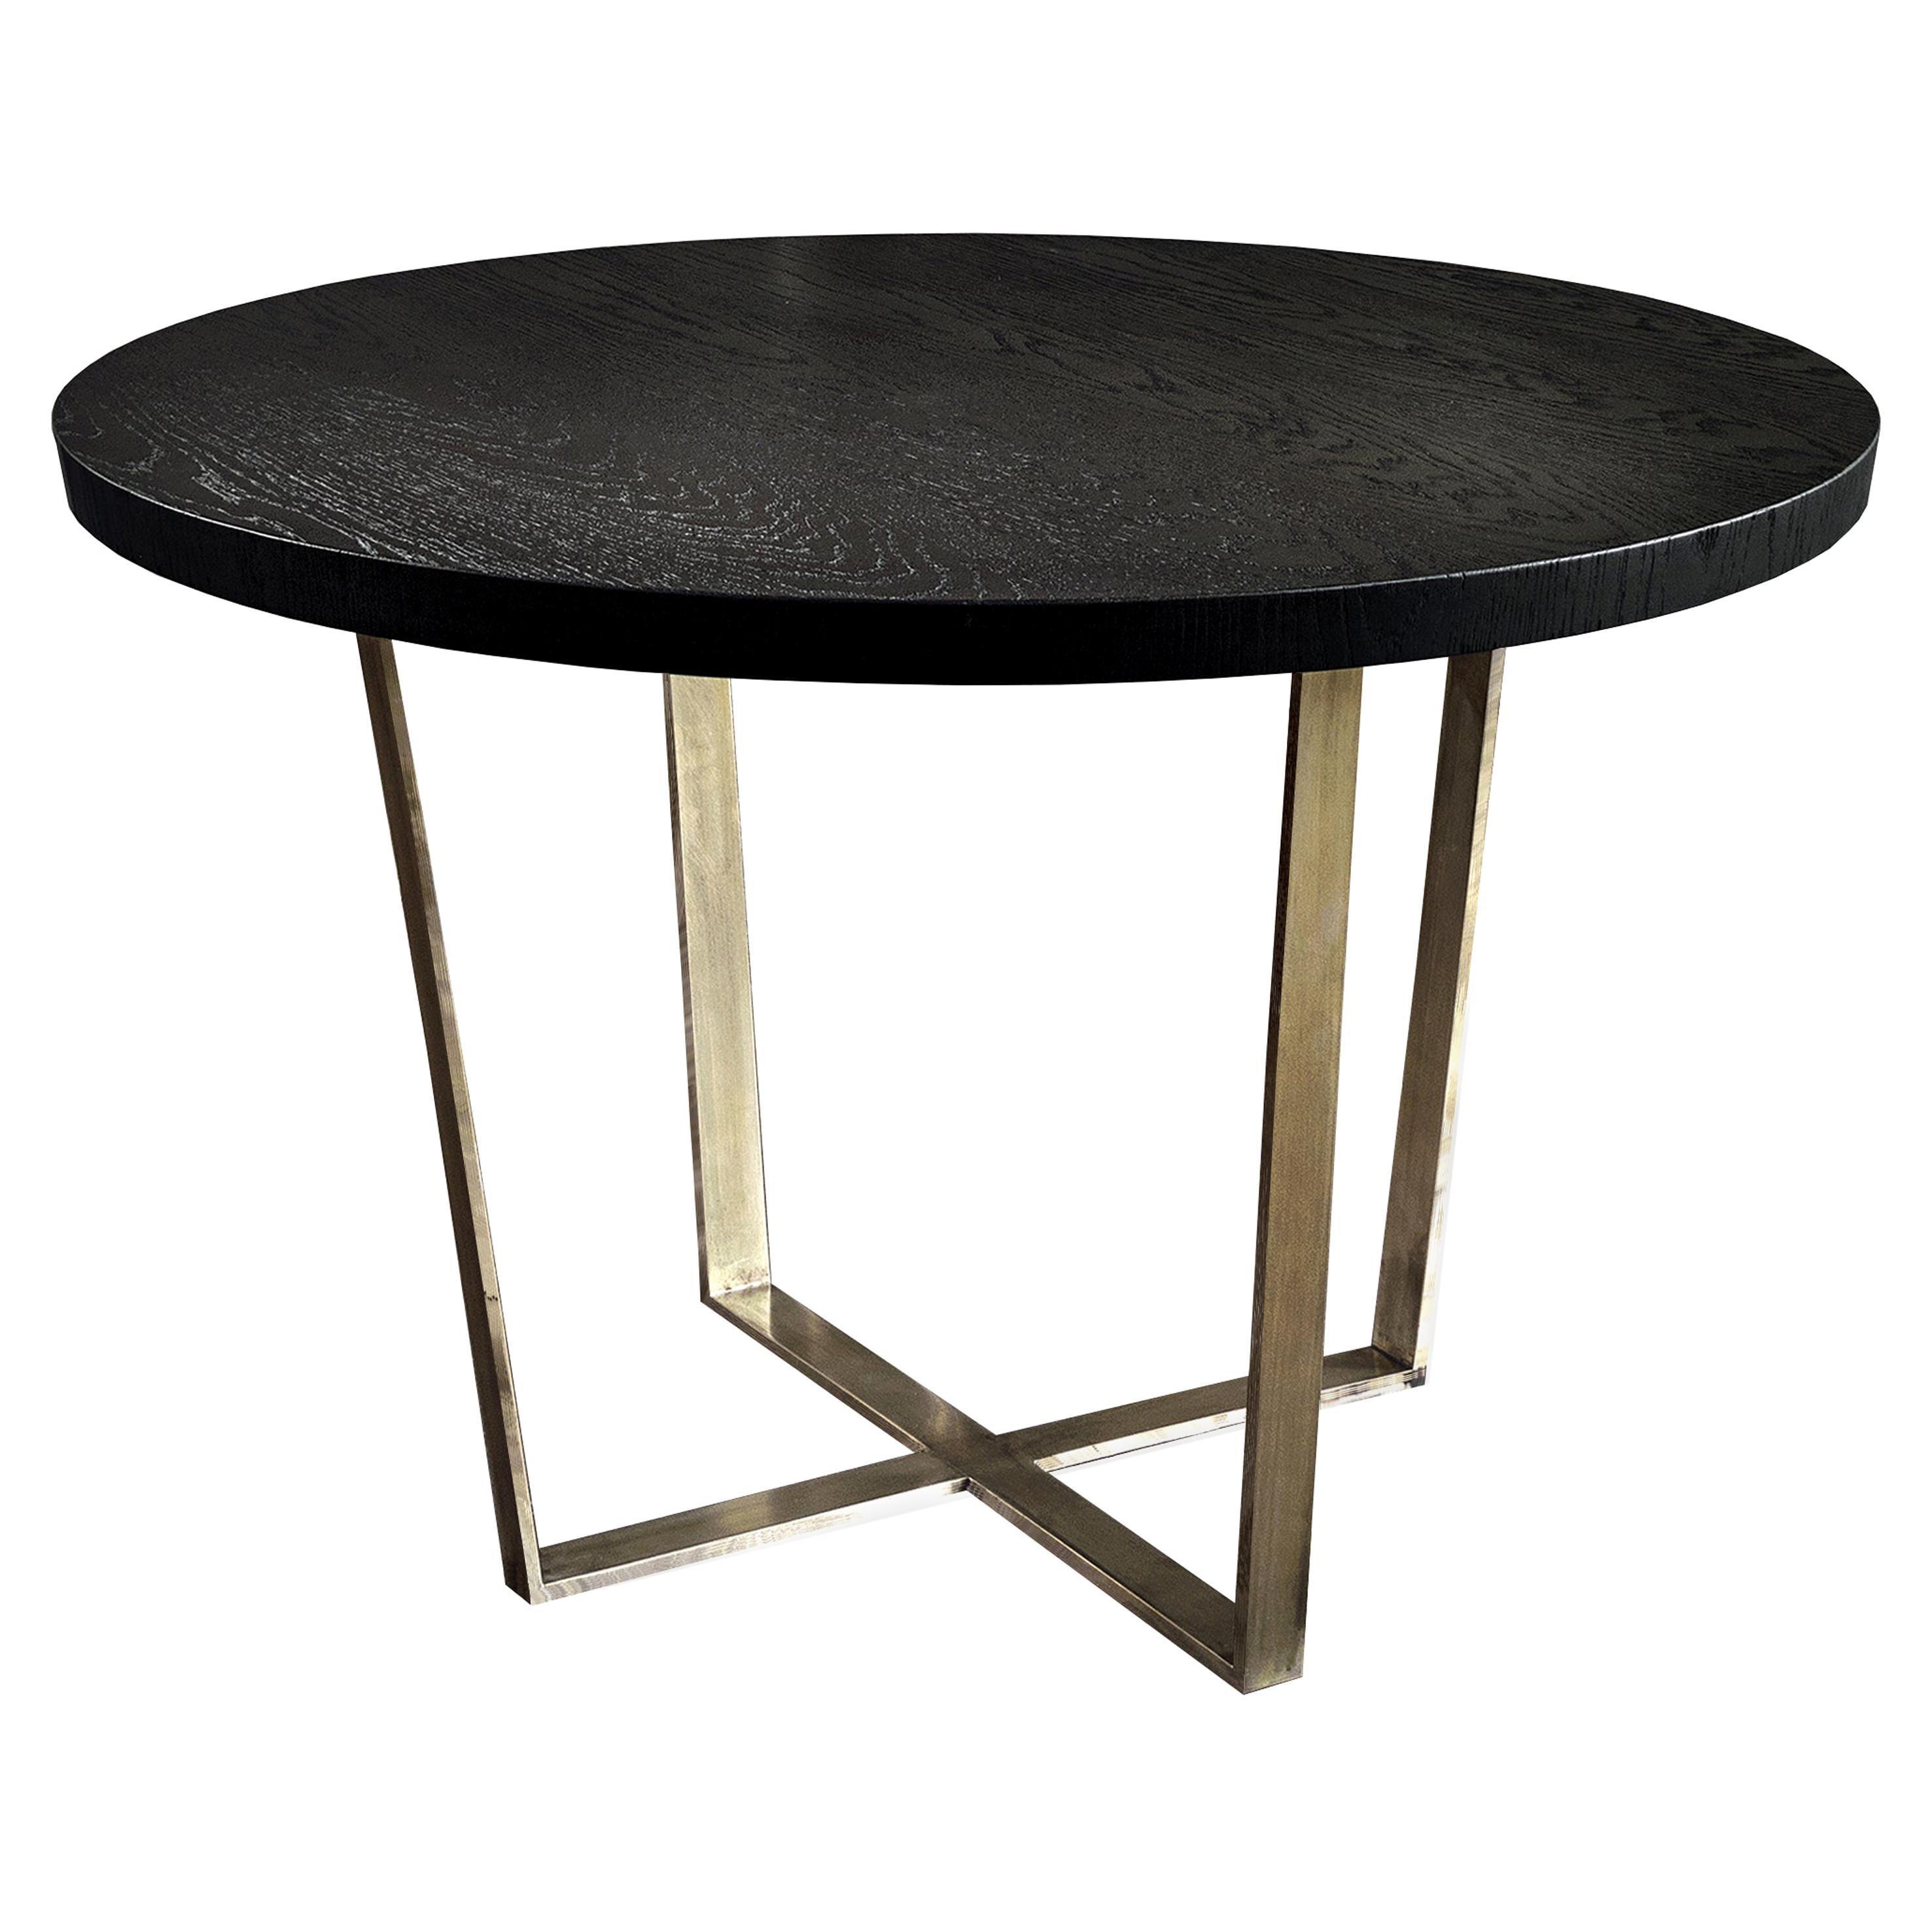 21st Century by Pelizzari Studio Black Oak Wood Table Etched Brass Legs